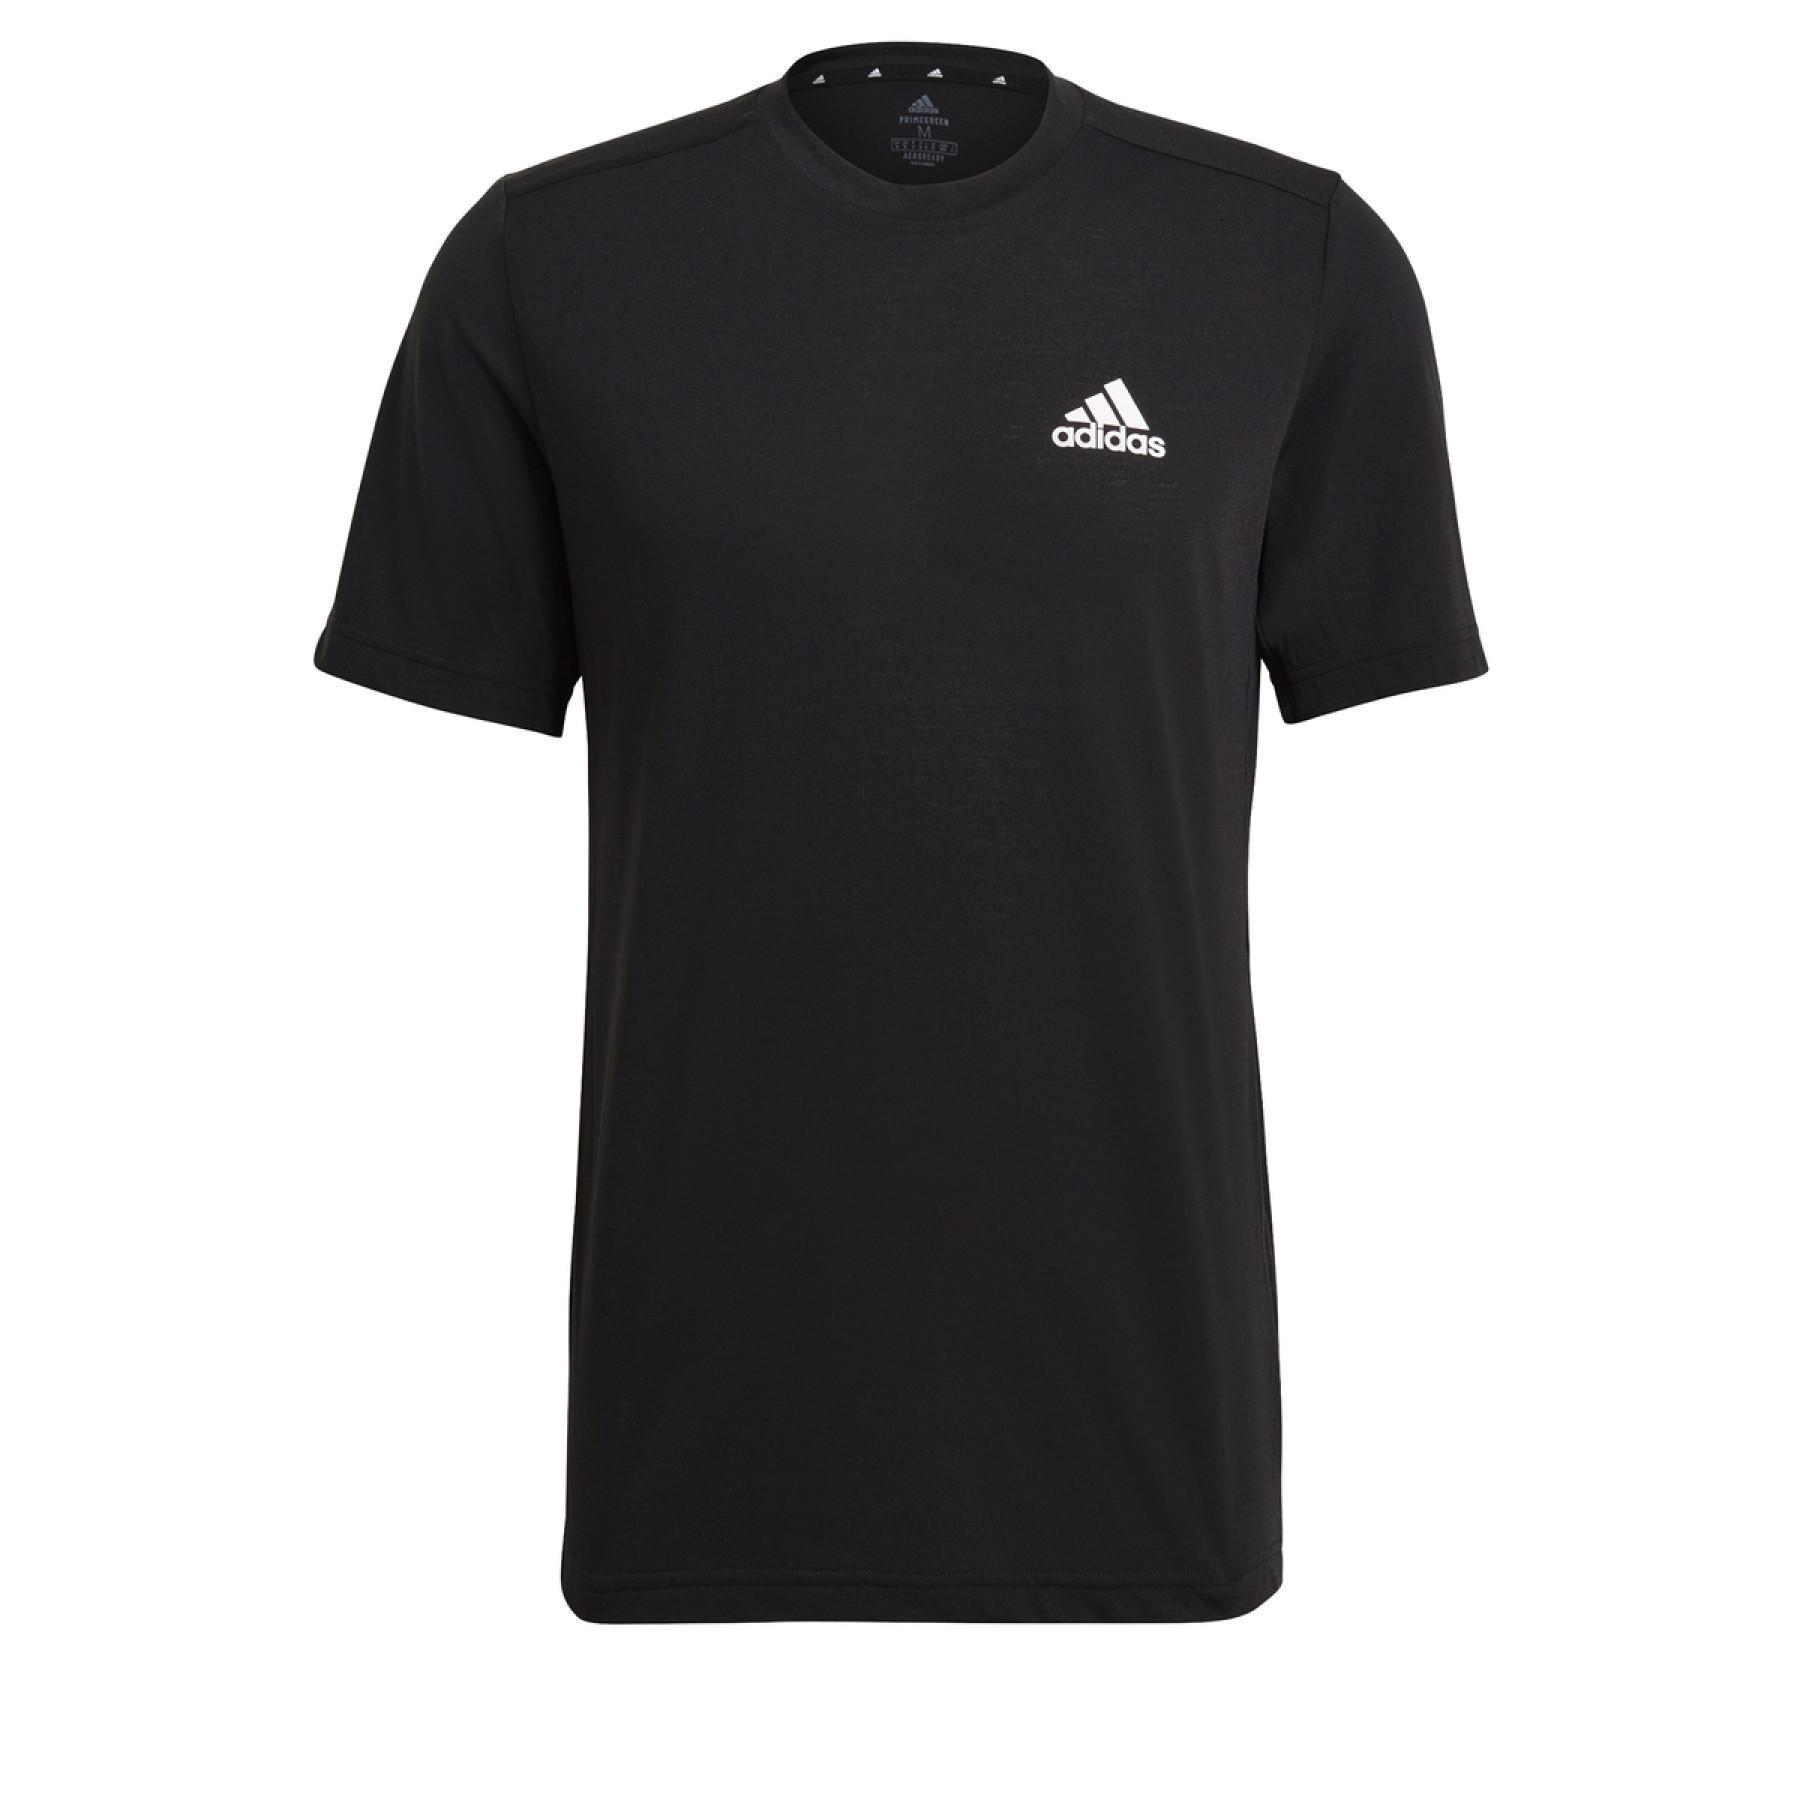 adidas D2M Feel Ready T-Shirt